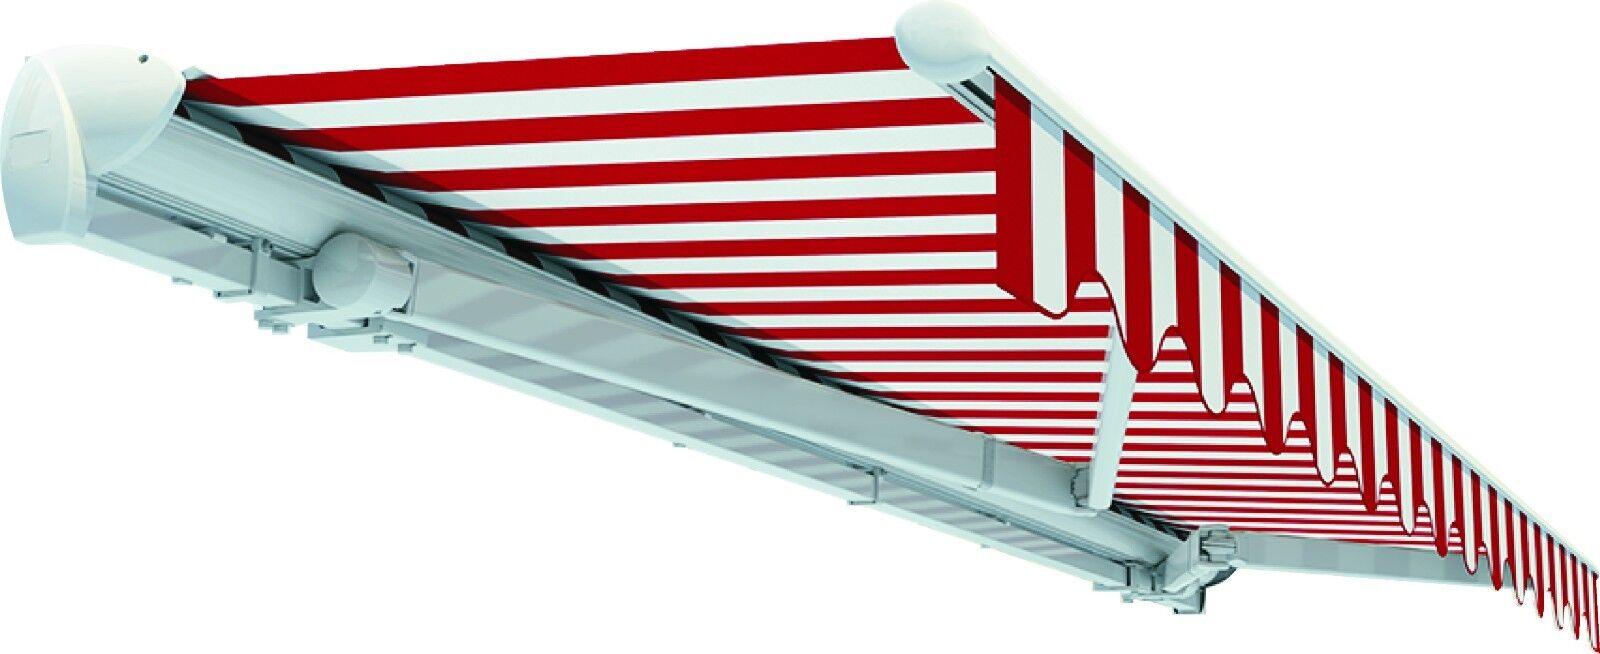 halbkassettenmarkise elektrische alu markise balkon terrase sonnenschutz eur 799 00. Black Bedroom Furniture Sets. Home Design Ideas